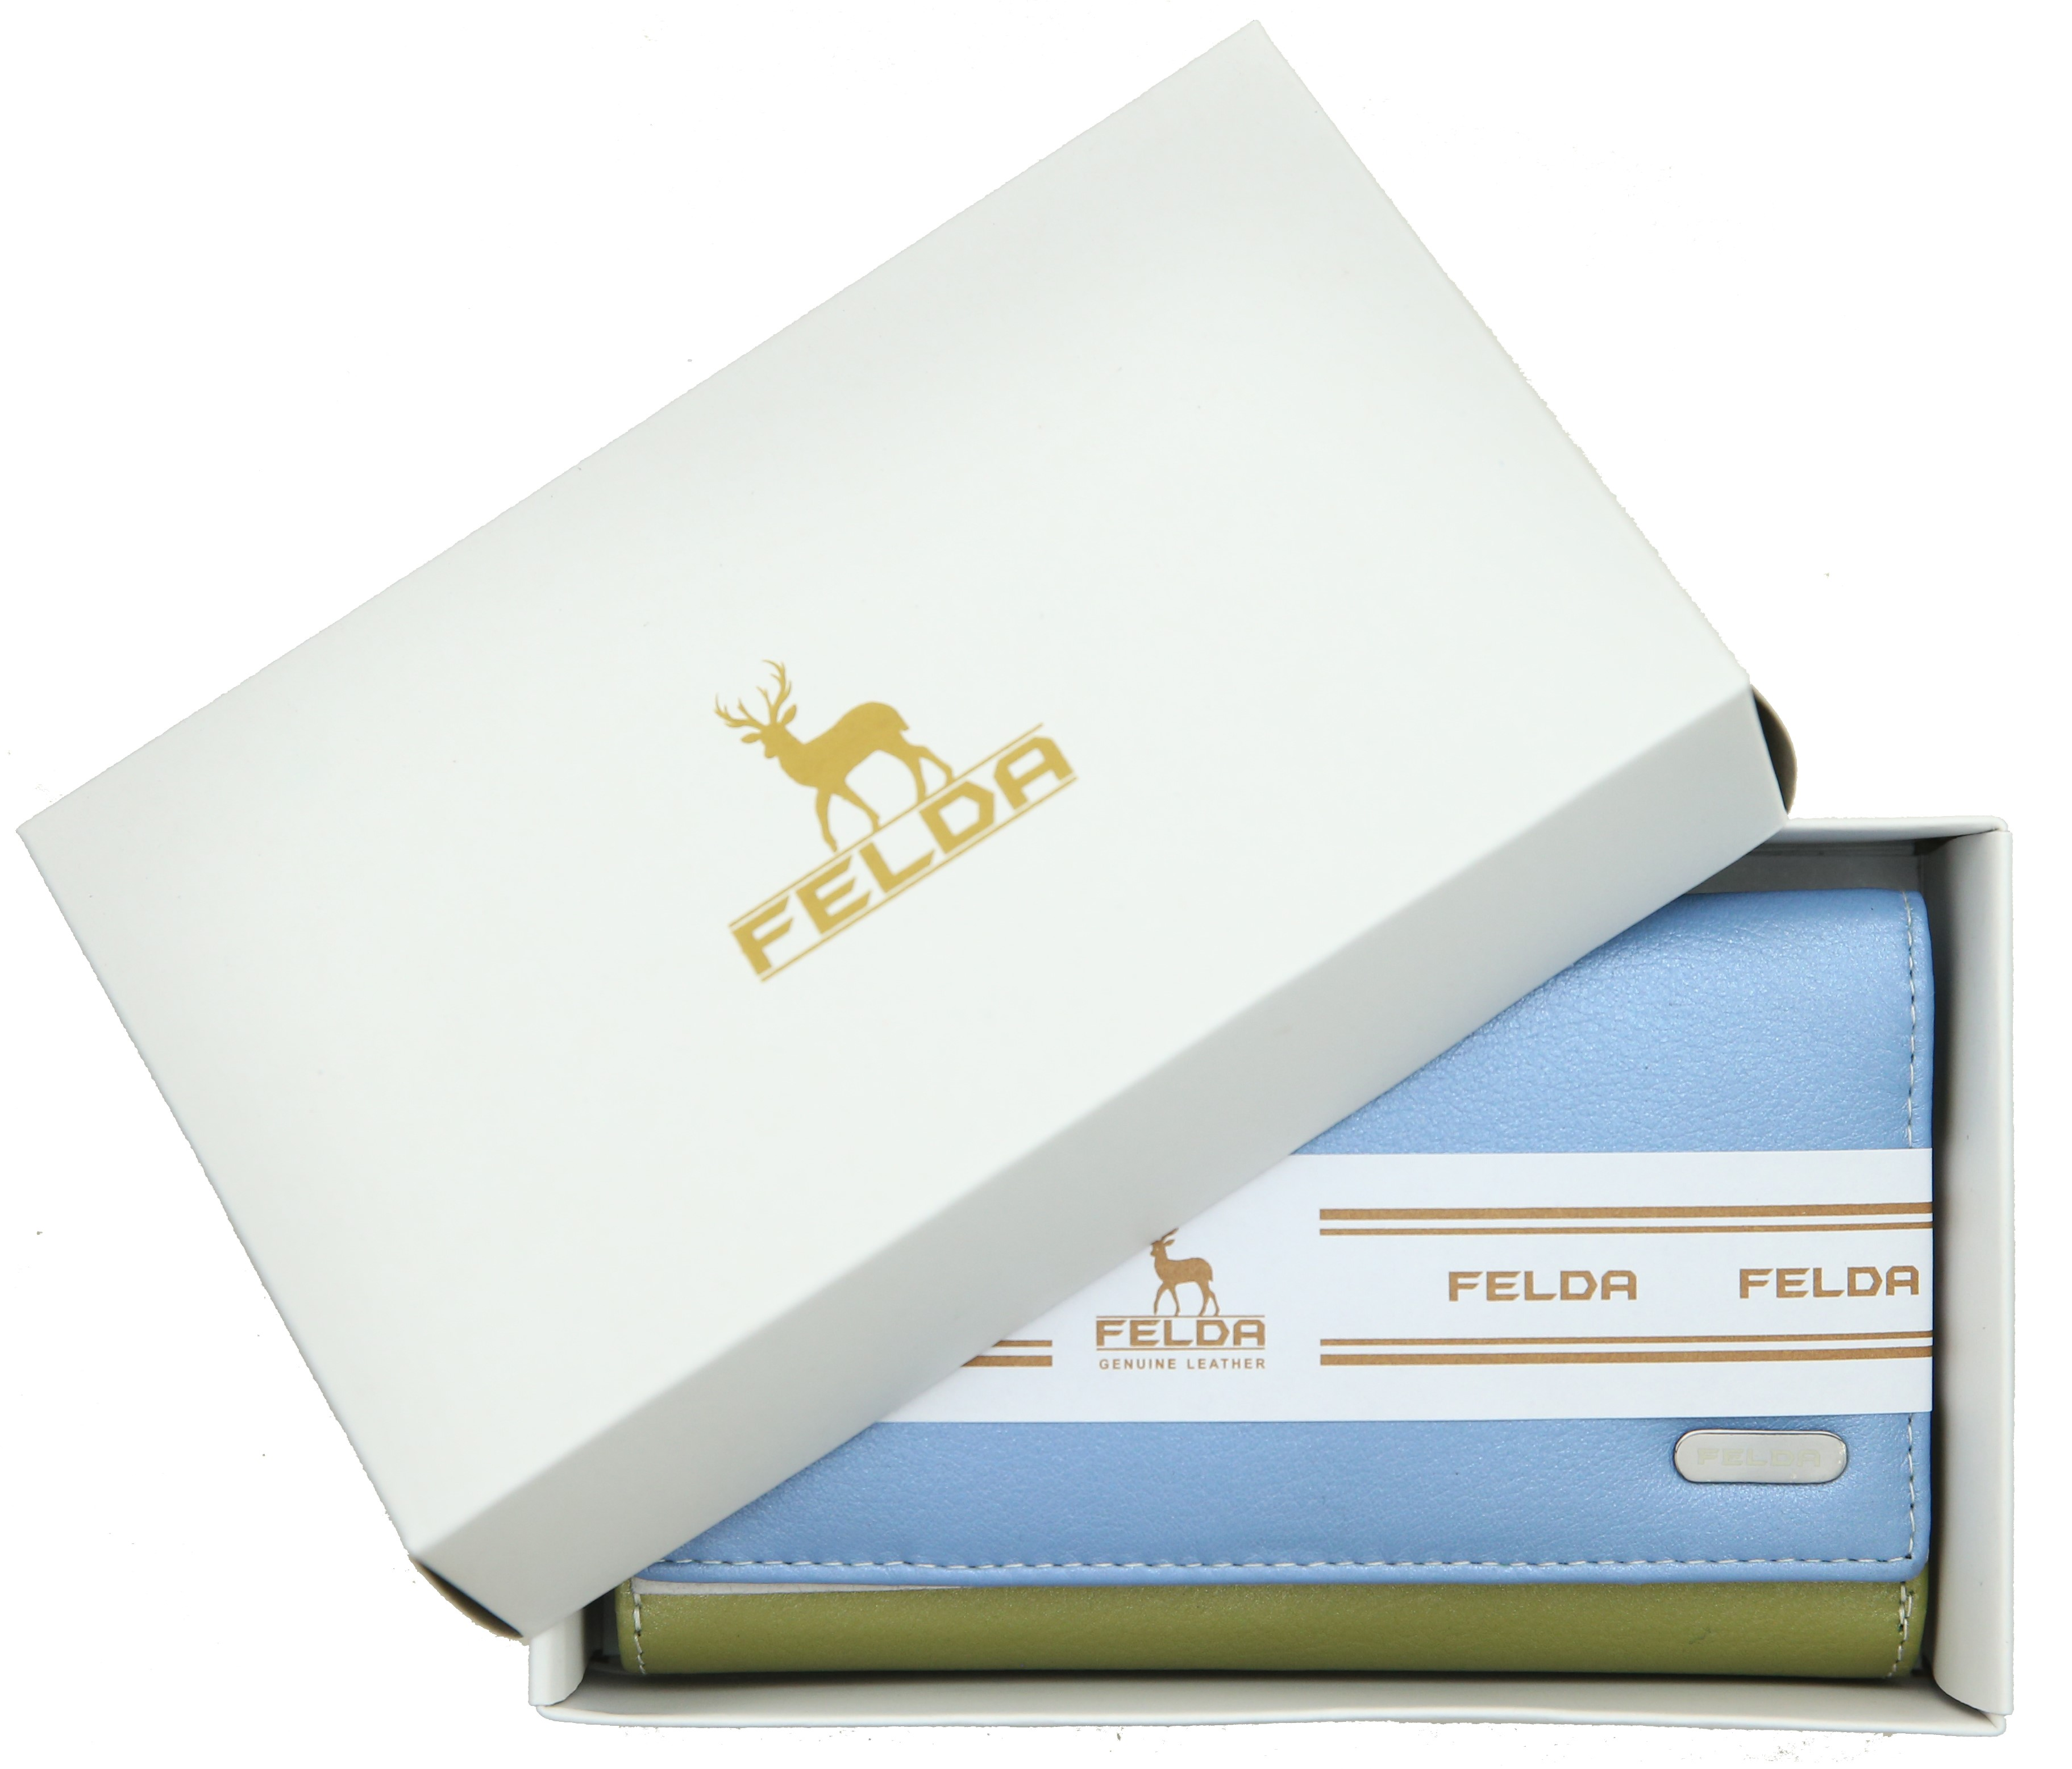 Felda-Portefeuille-pour-cartes-de-credit-cuir-souple-plusieurs-coloris miniature 23